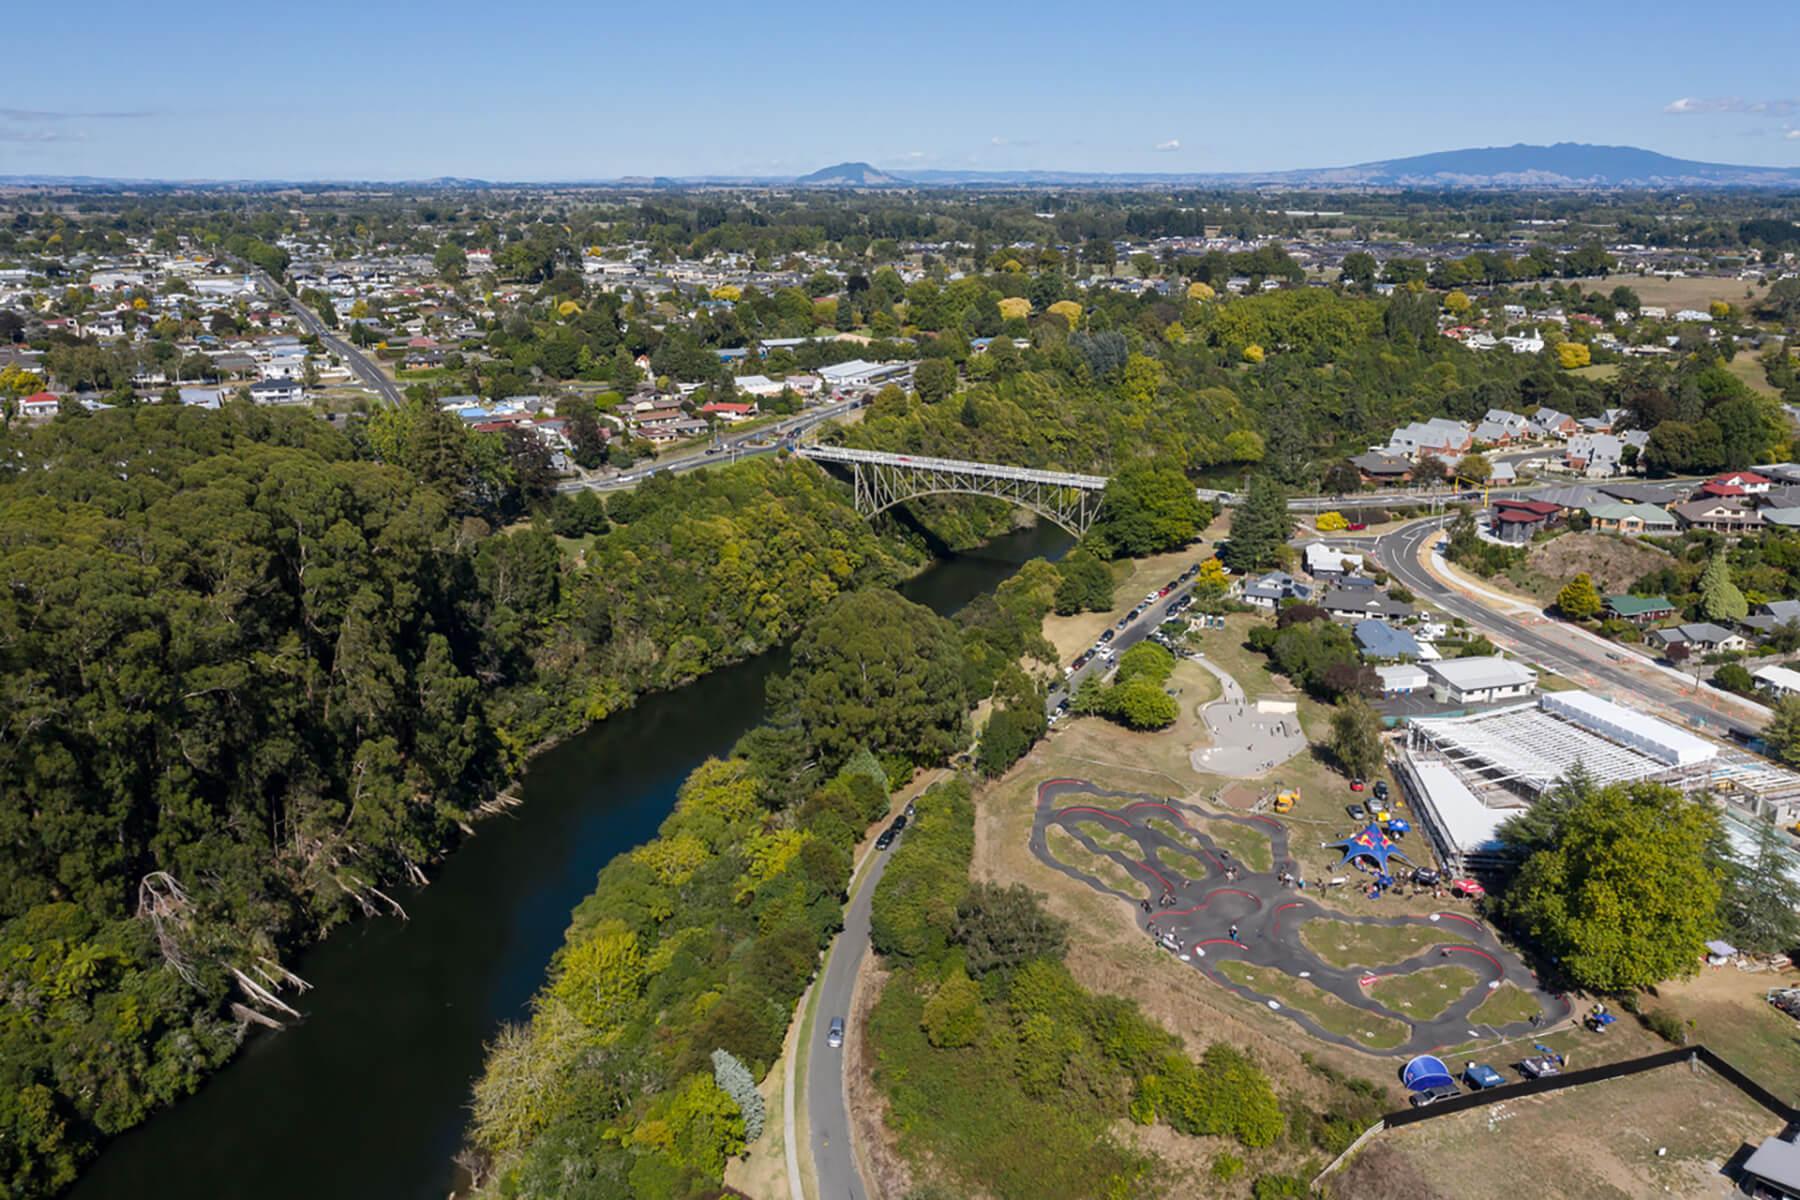 Red Bull Pump Track Cambridge, New Zealand - Dan Grifftihs